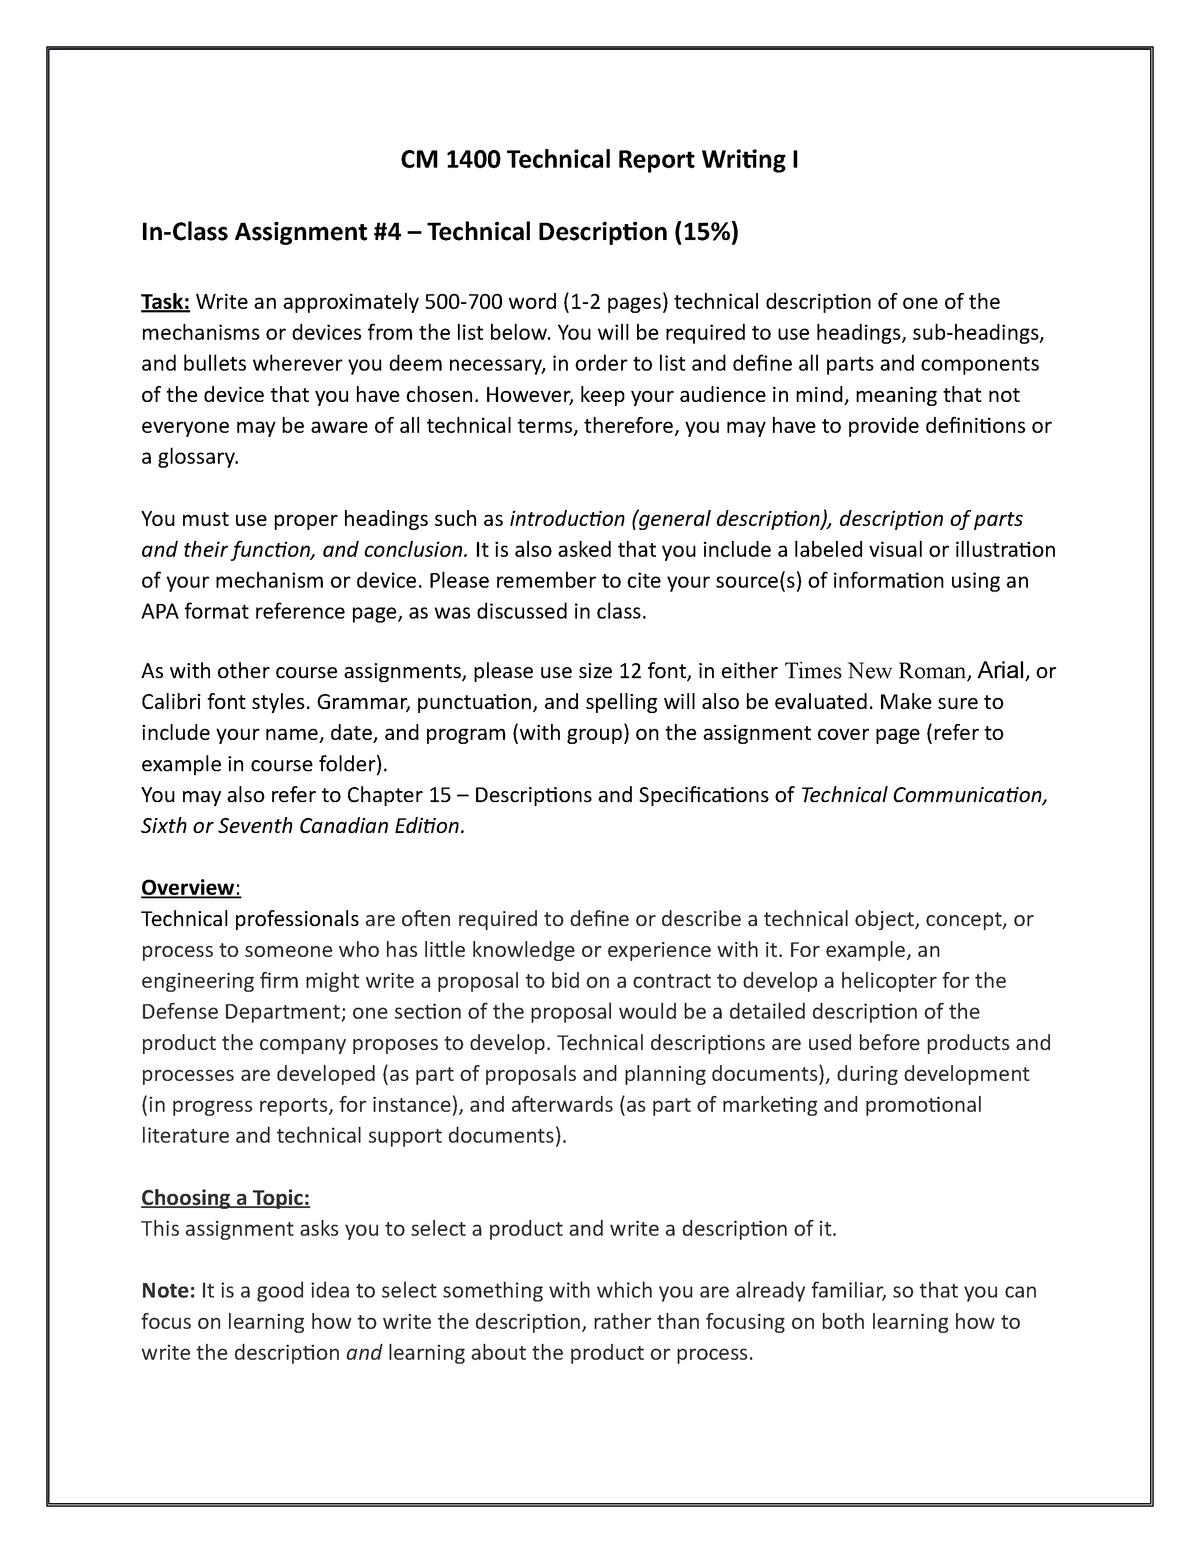 In-Class Assignment #4 -Technical Description - CM1400